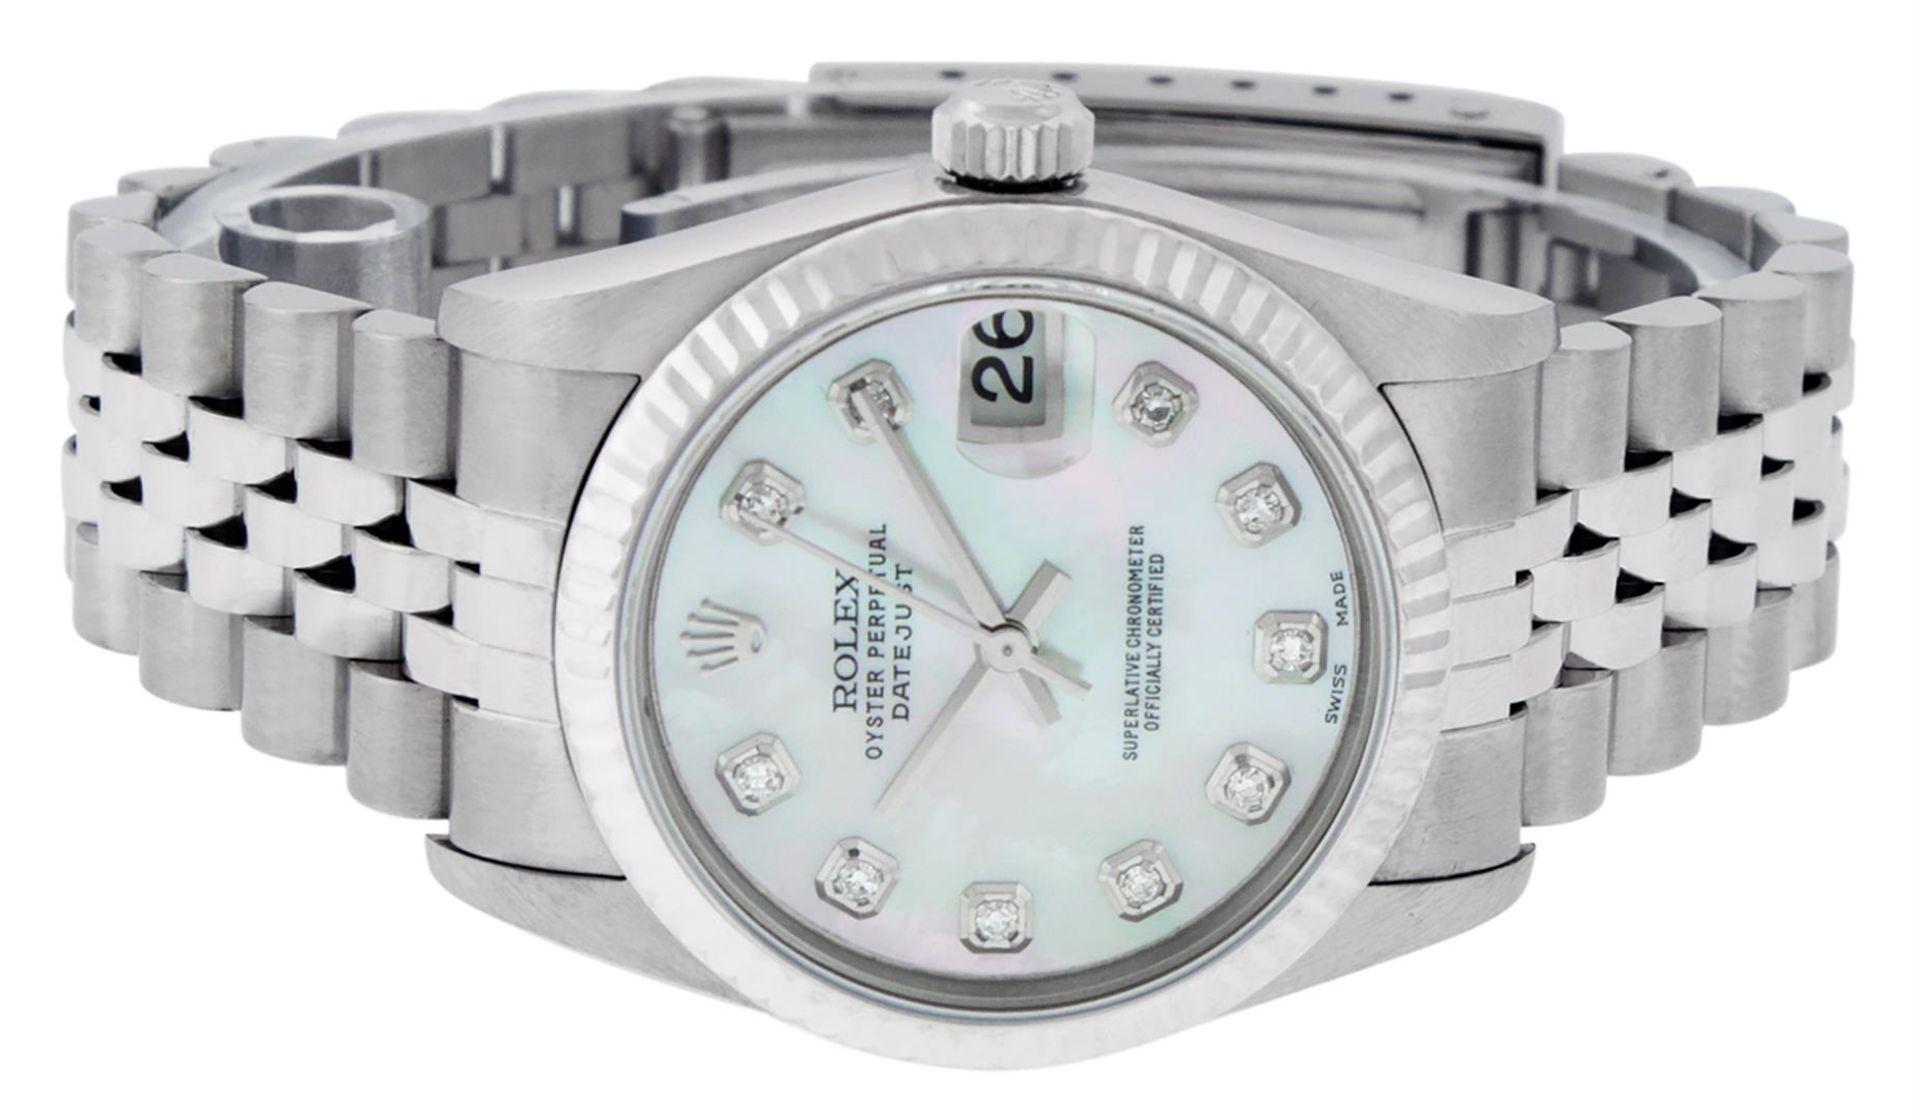 Rolex Womens Midsize Quickset 31mm MOP Diamond Stainless Steel Datejust Wriswatc - Image 3 of 9